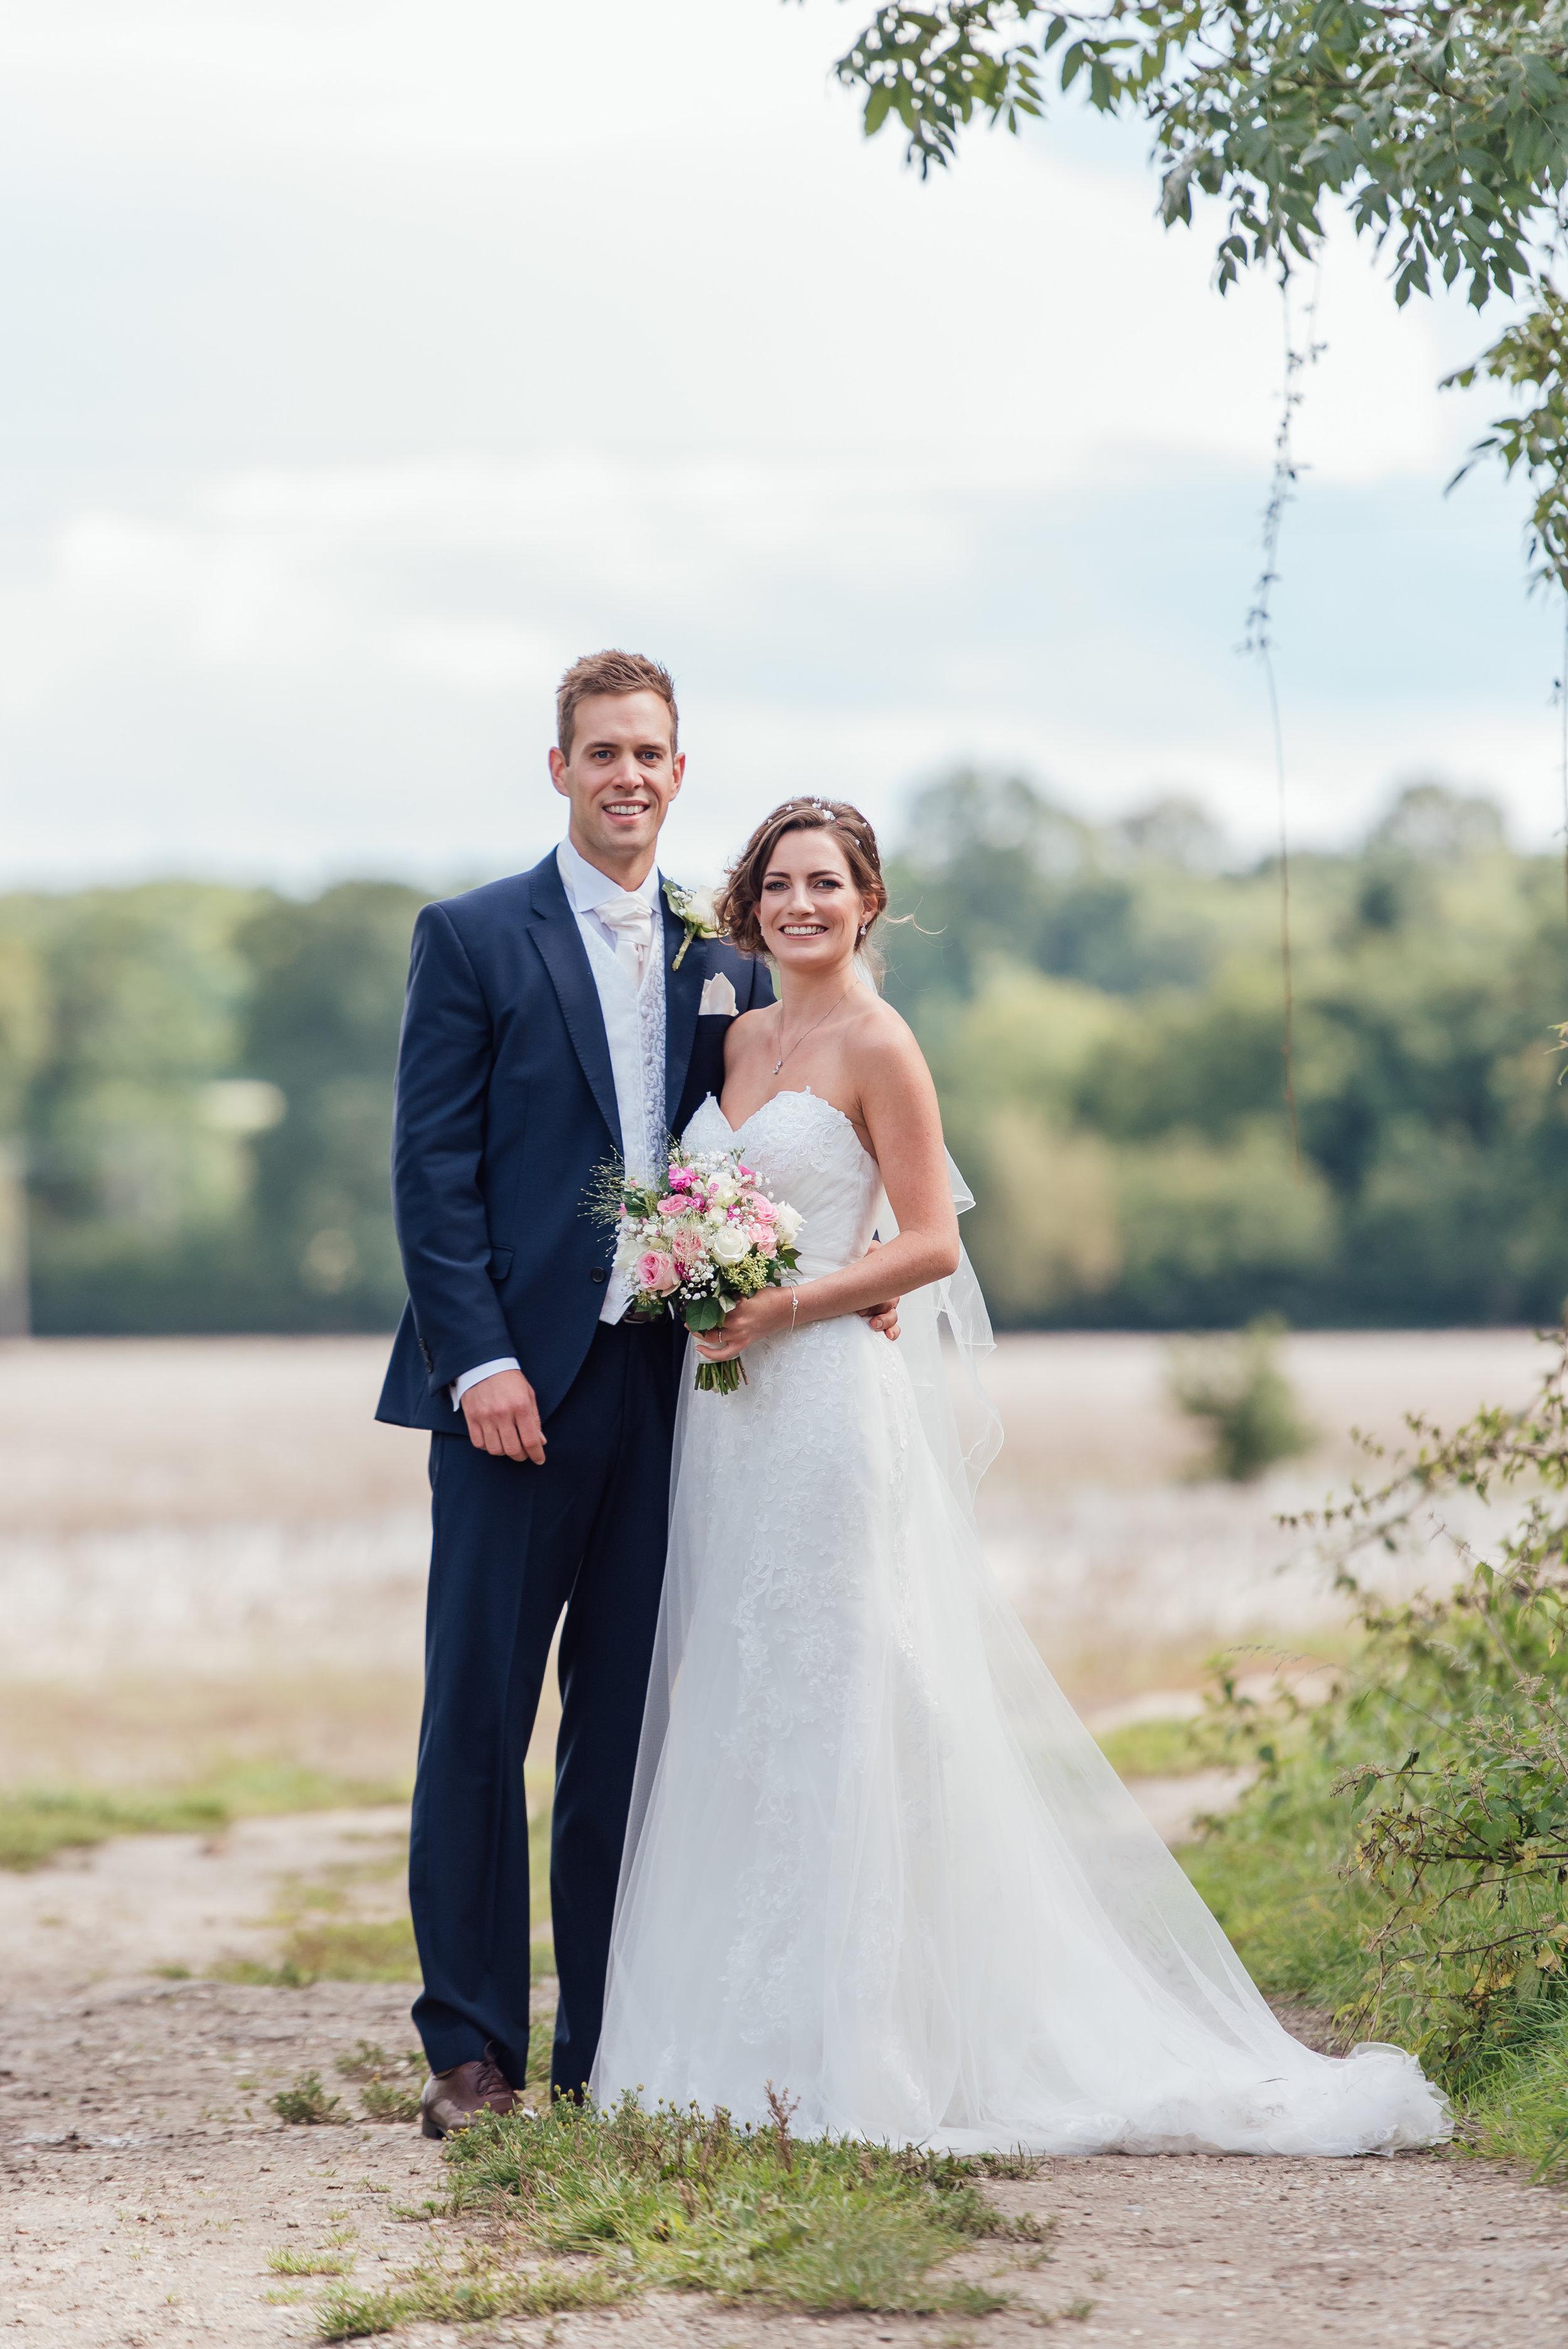 Rotherwick-village-hall-wedding-hampshire / Hampshire-wedding-photographer-hampshire / Amy-james-photography / fleet-wedding-photographer-fleet / village-hall-wedding-hampshire